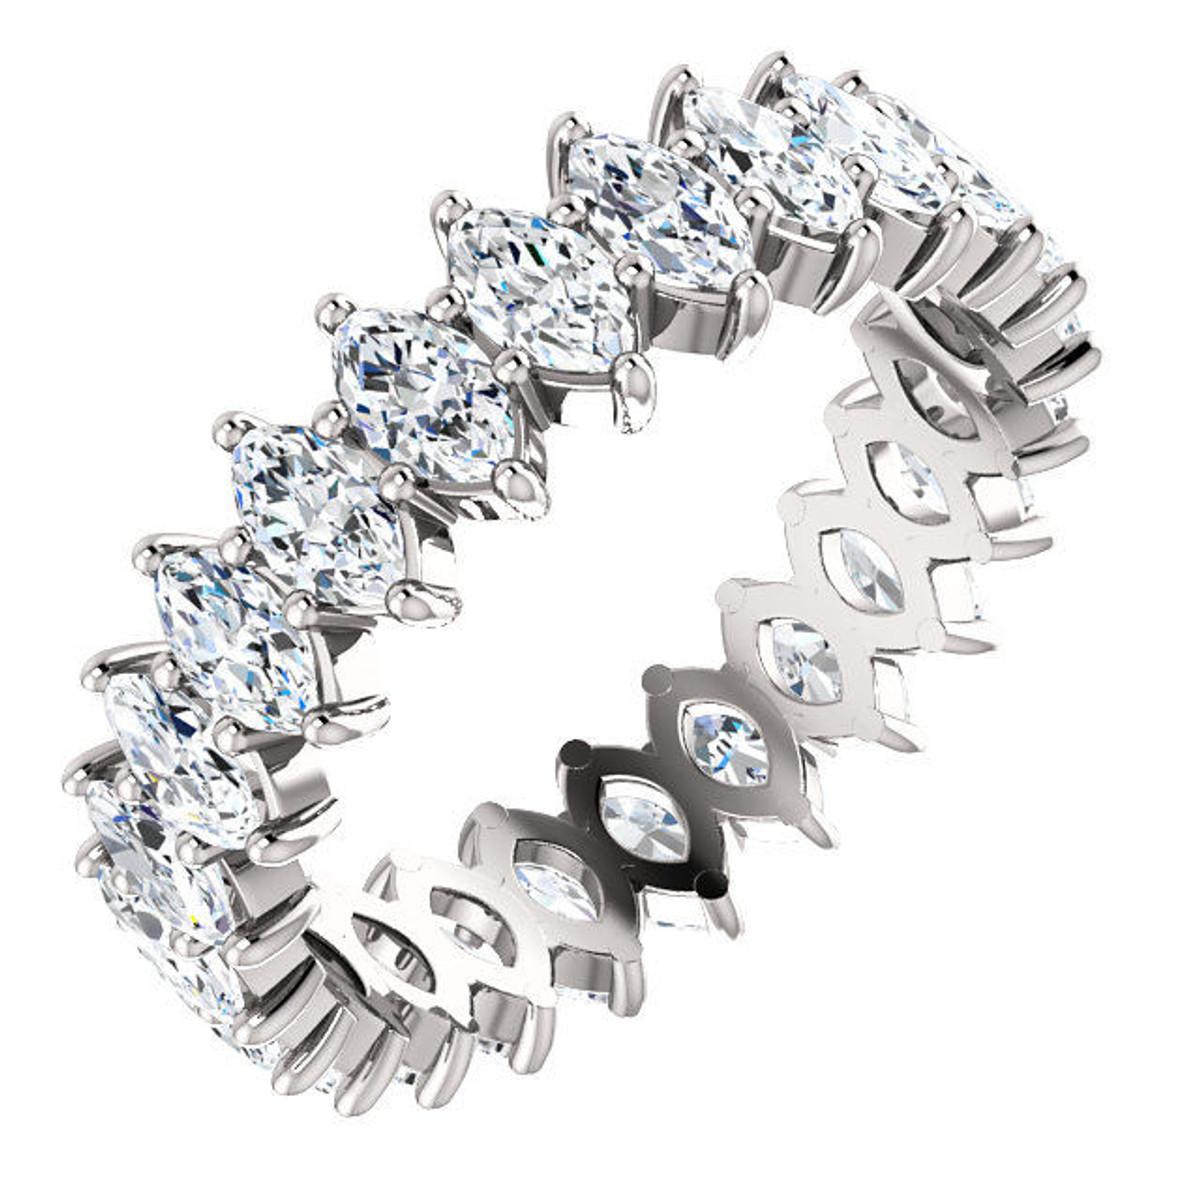 White Gold 3.0 ct tw Marquise Diamond Eternity Ring